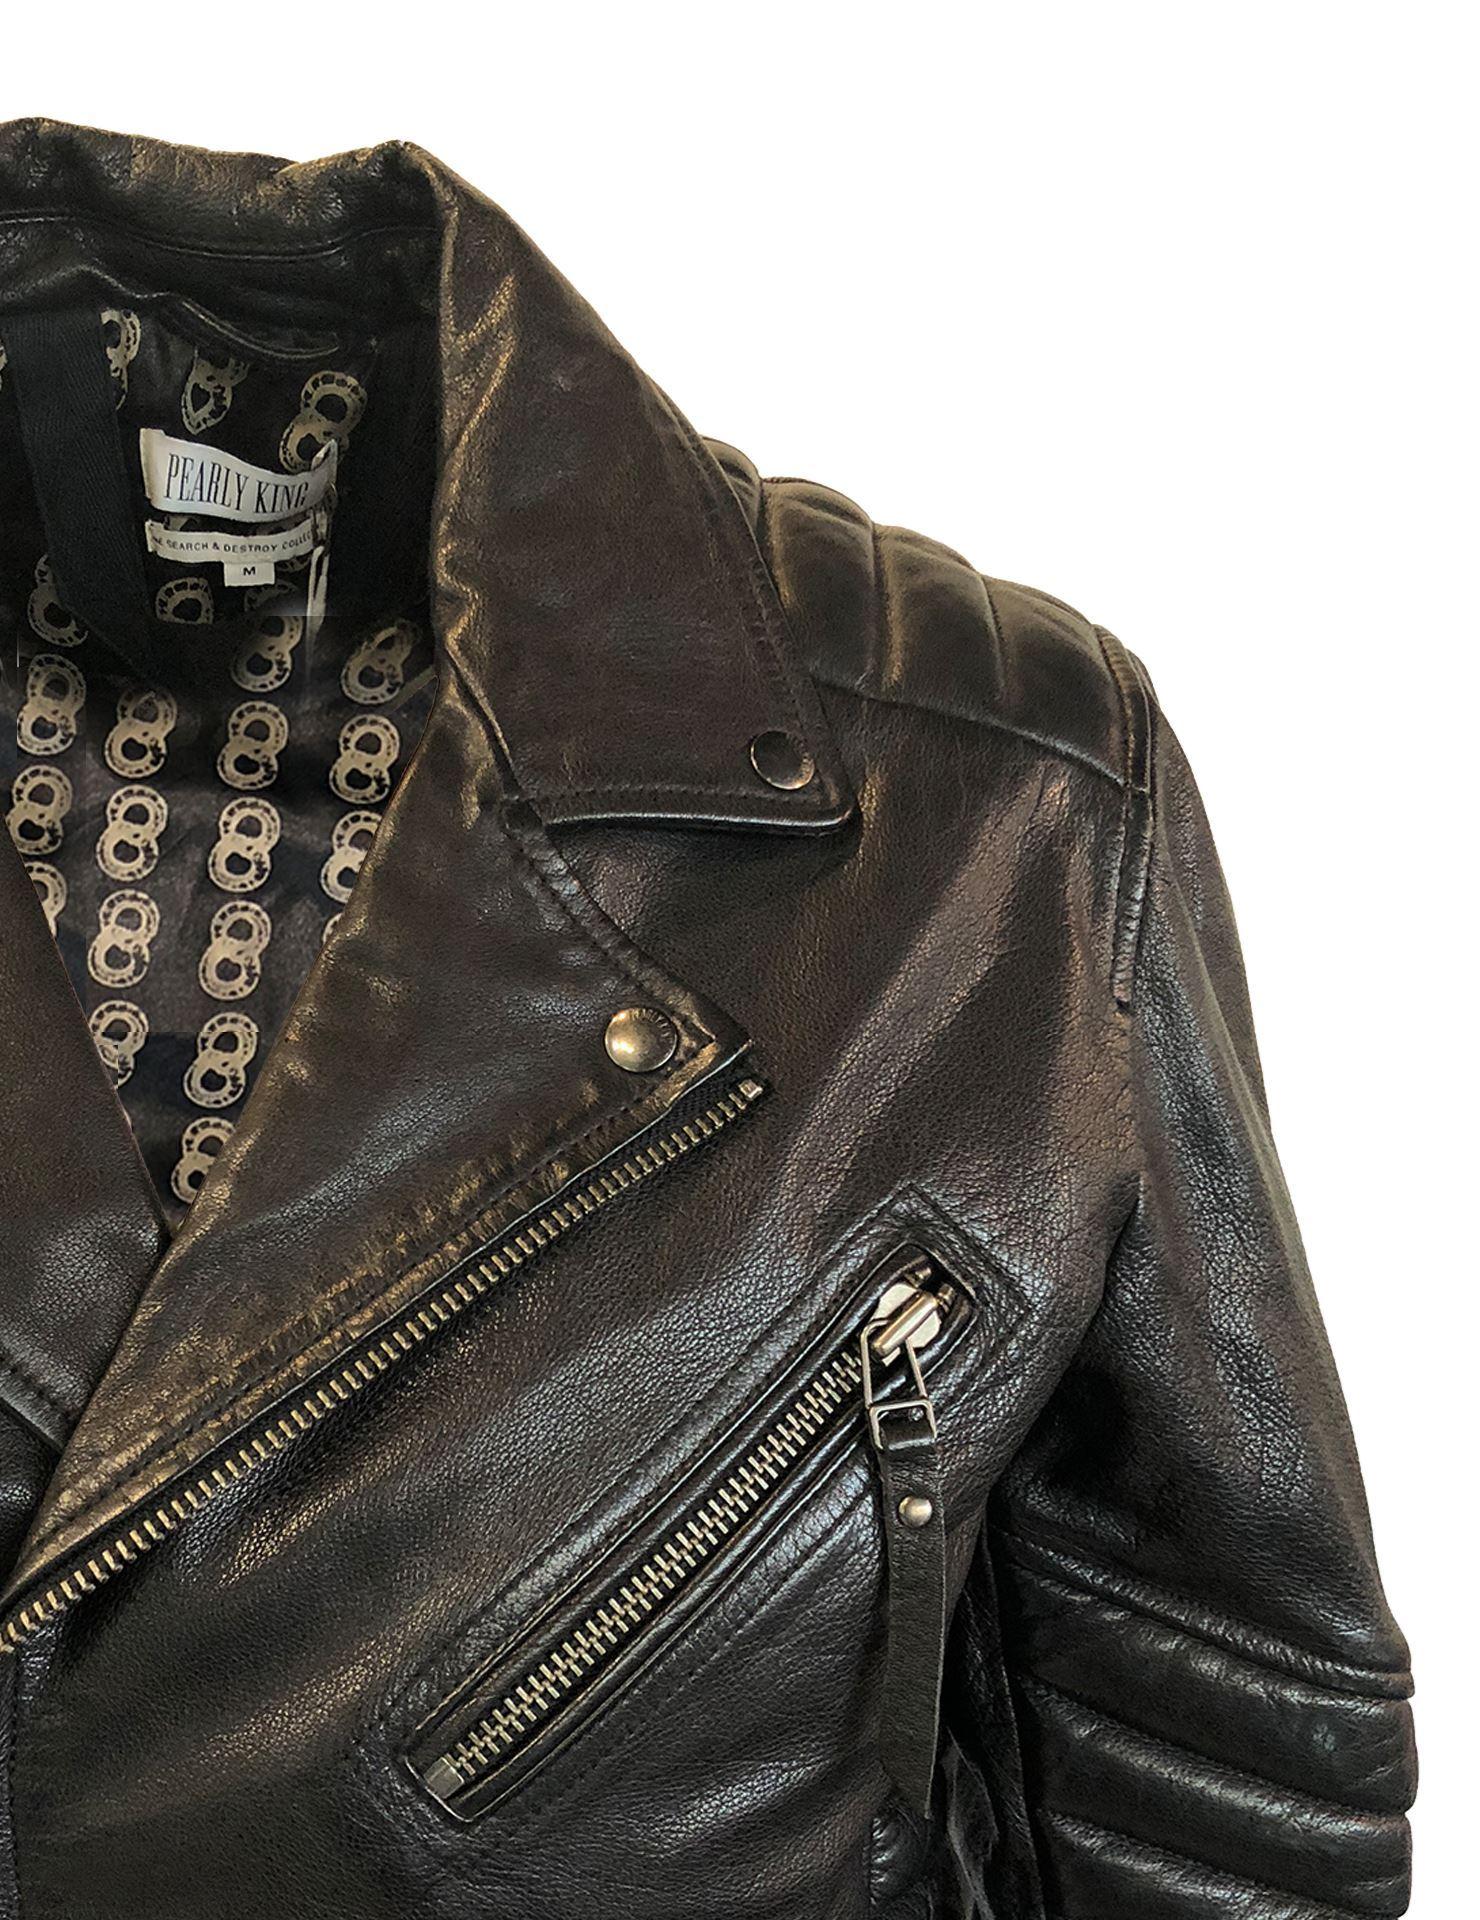 Pearly King Leather Jacket - George Harrison|Designer Menswear in ...